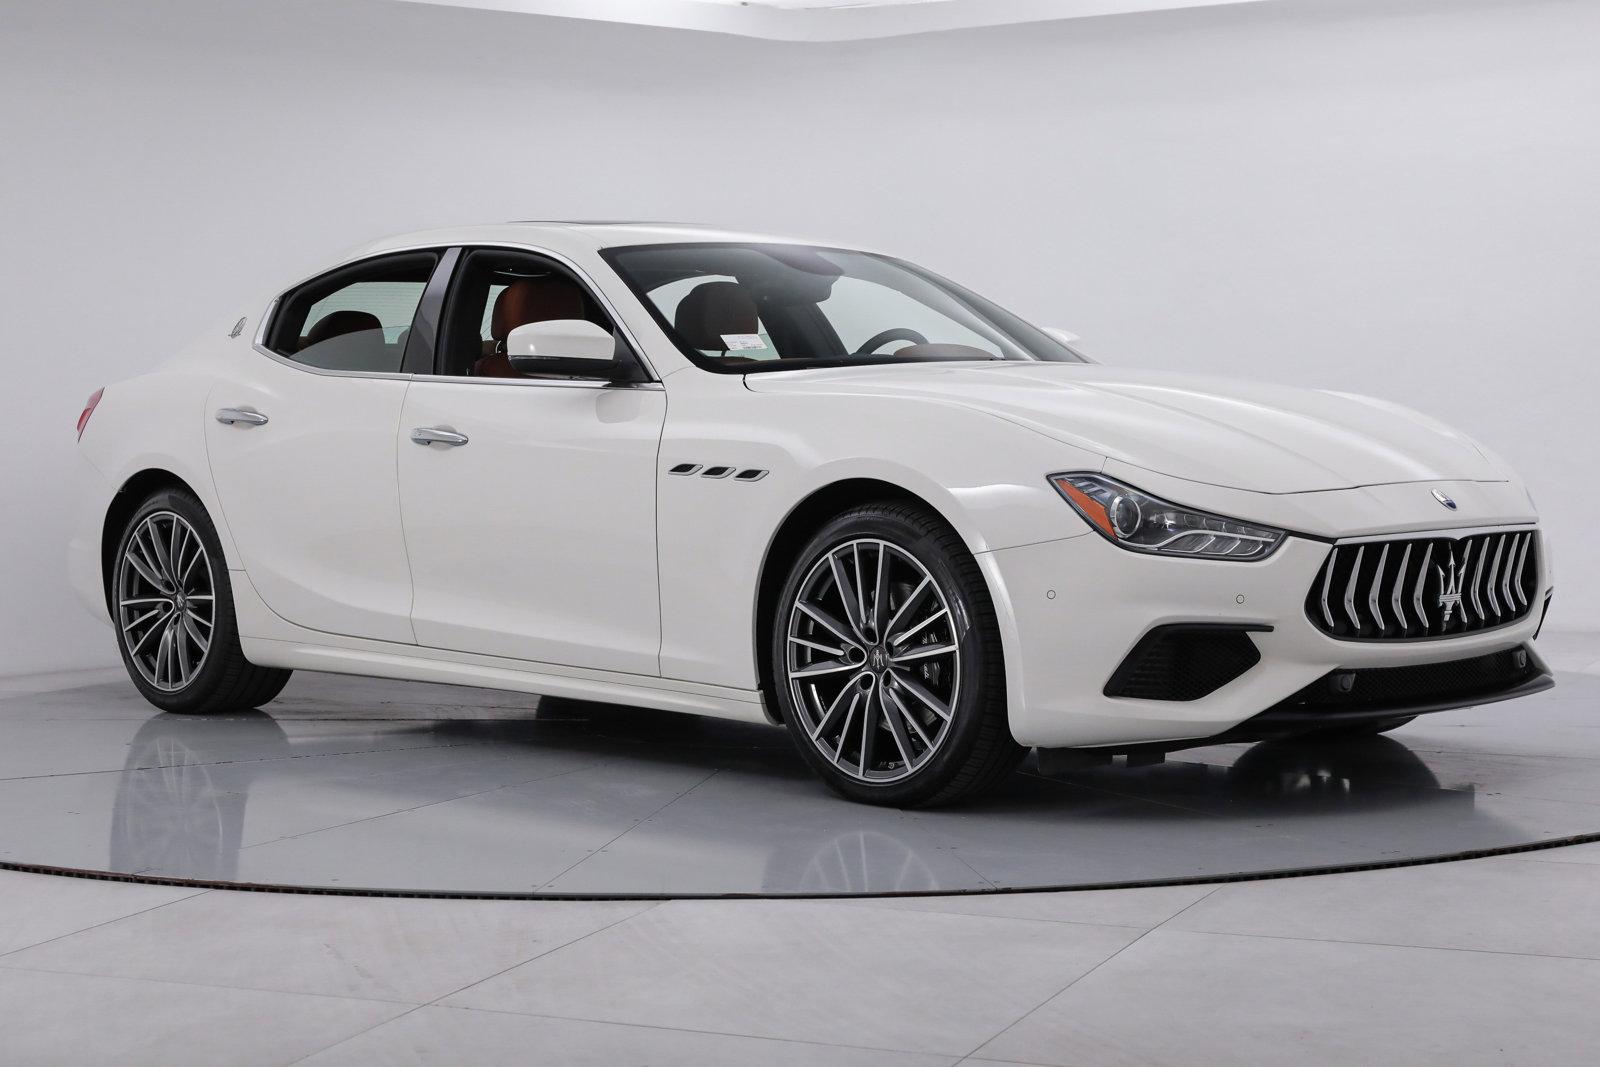 Certified Pre-Owned 2020 Maserati Ghibli